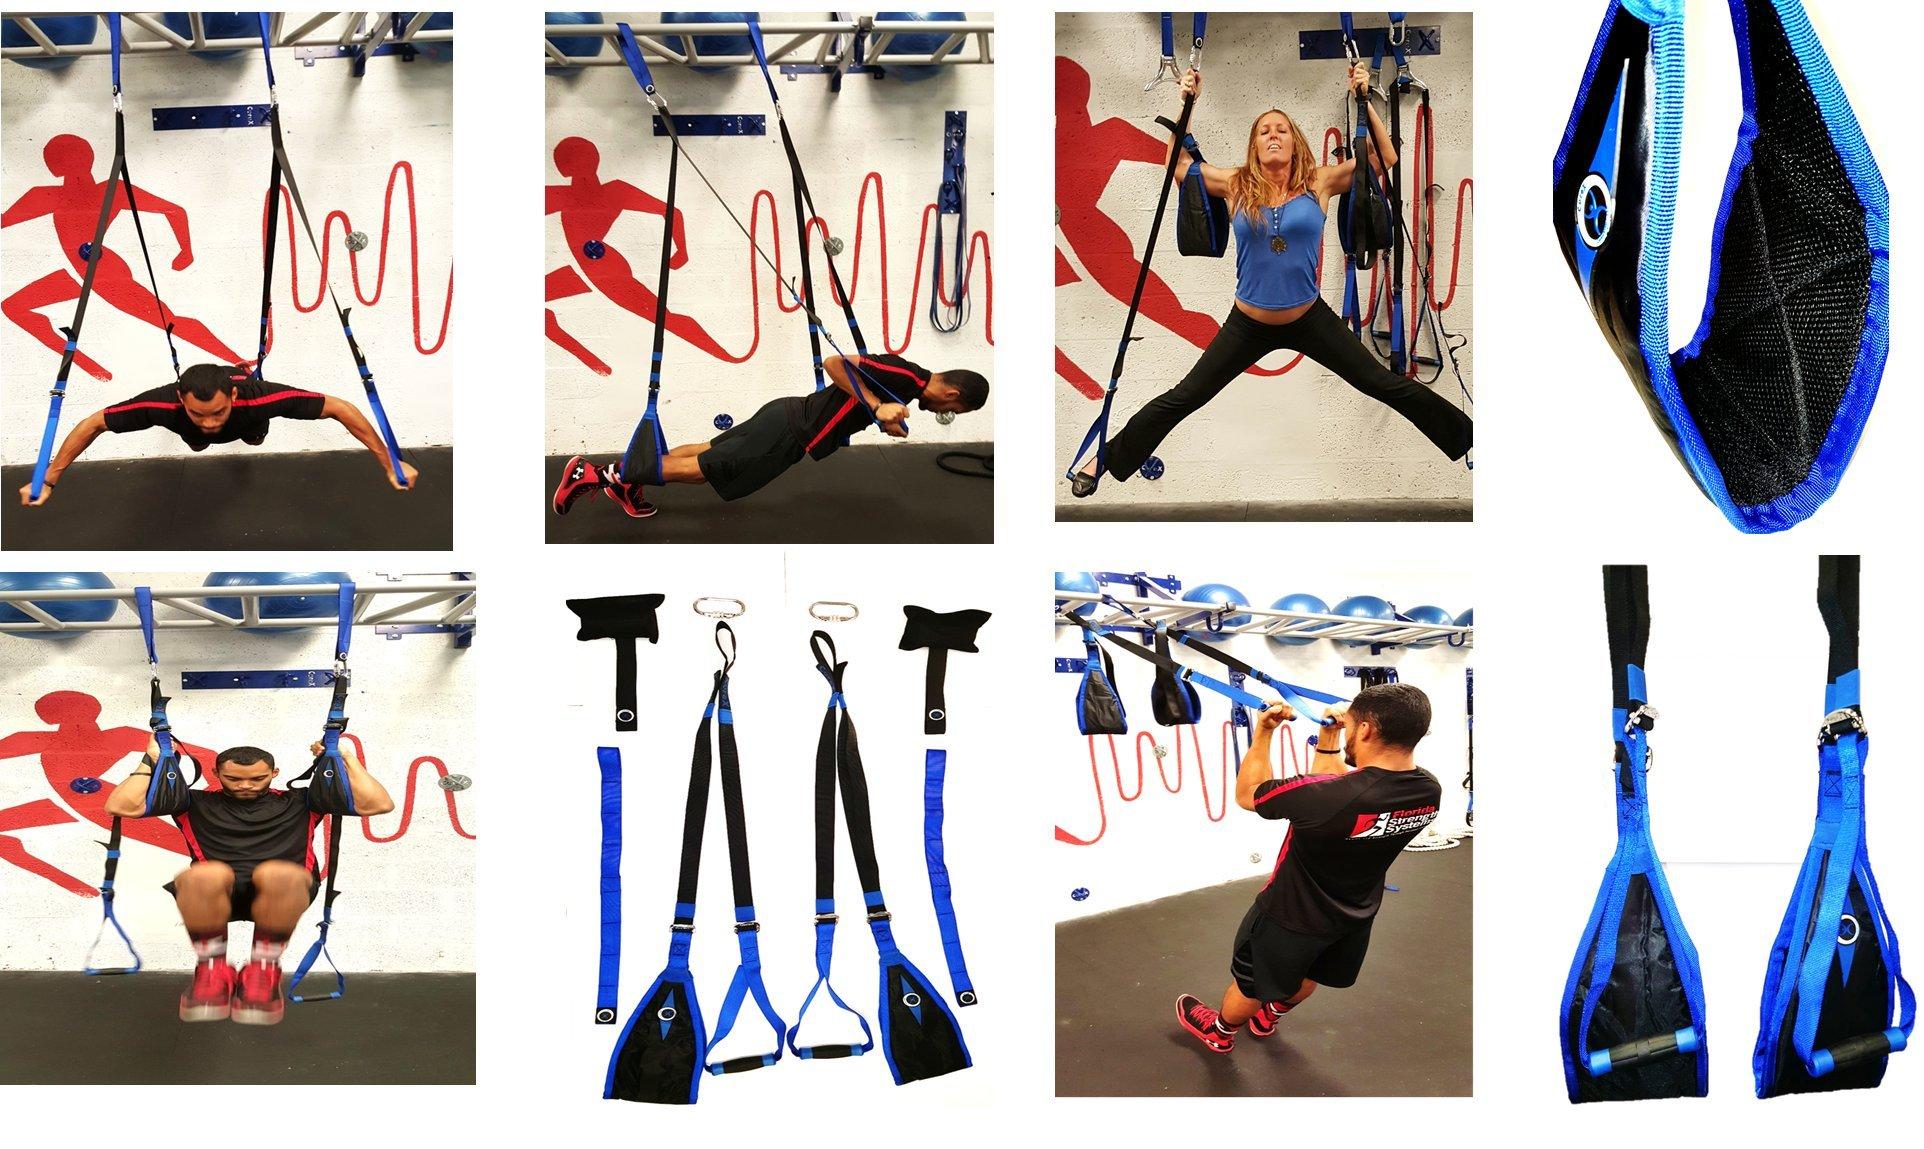 CoreX Suspended Trainer - Fully Suspended Training, Ab Strap, Suspension Strap Training, Pilates, Yoga Inversion, Yoga Swing